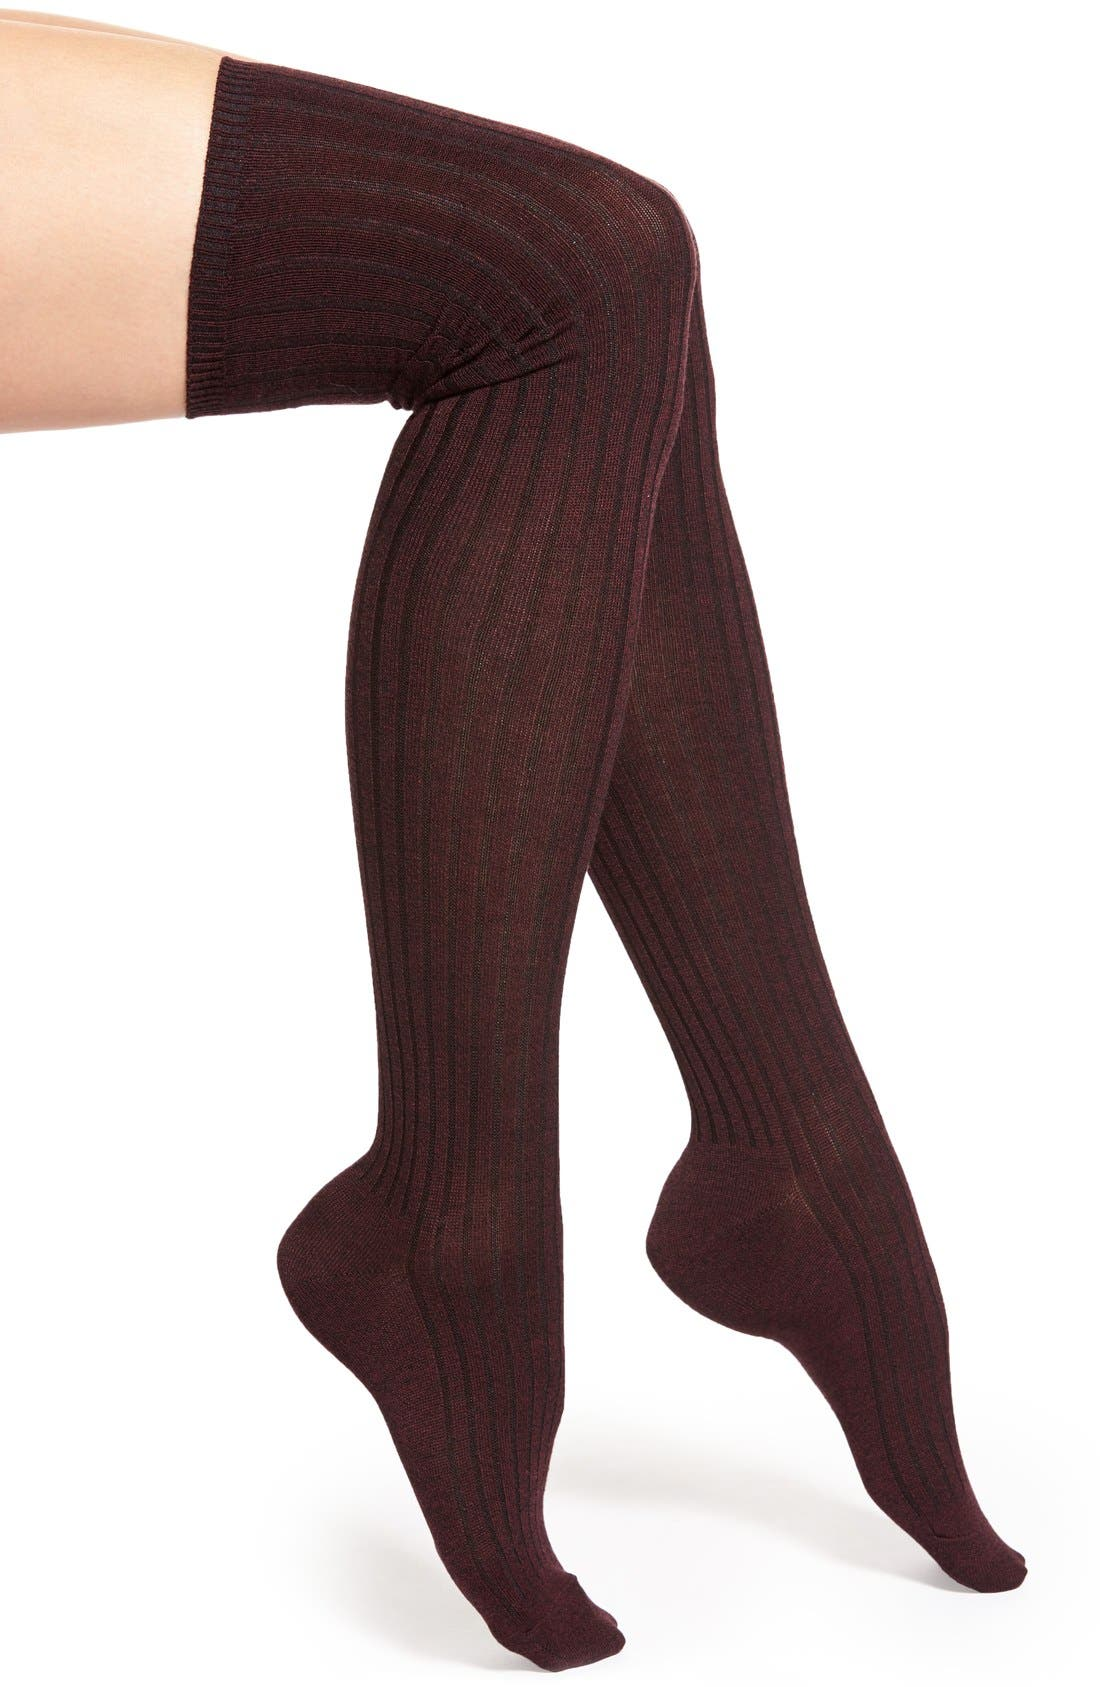 Alternate Image 1 Selected - Hue Marled Rib Knit Over the Knee Socks